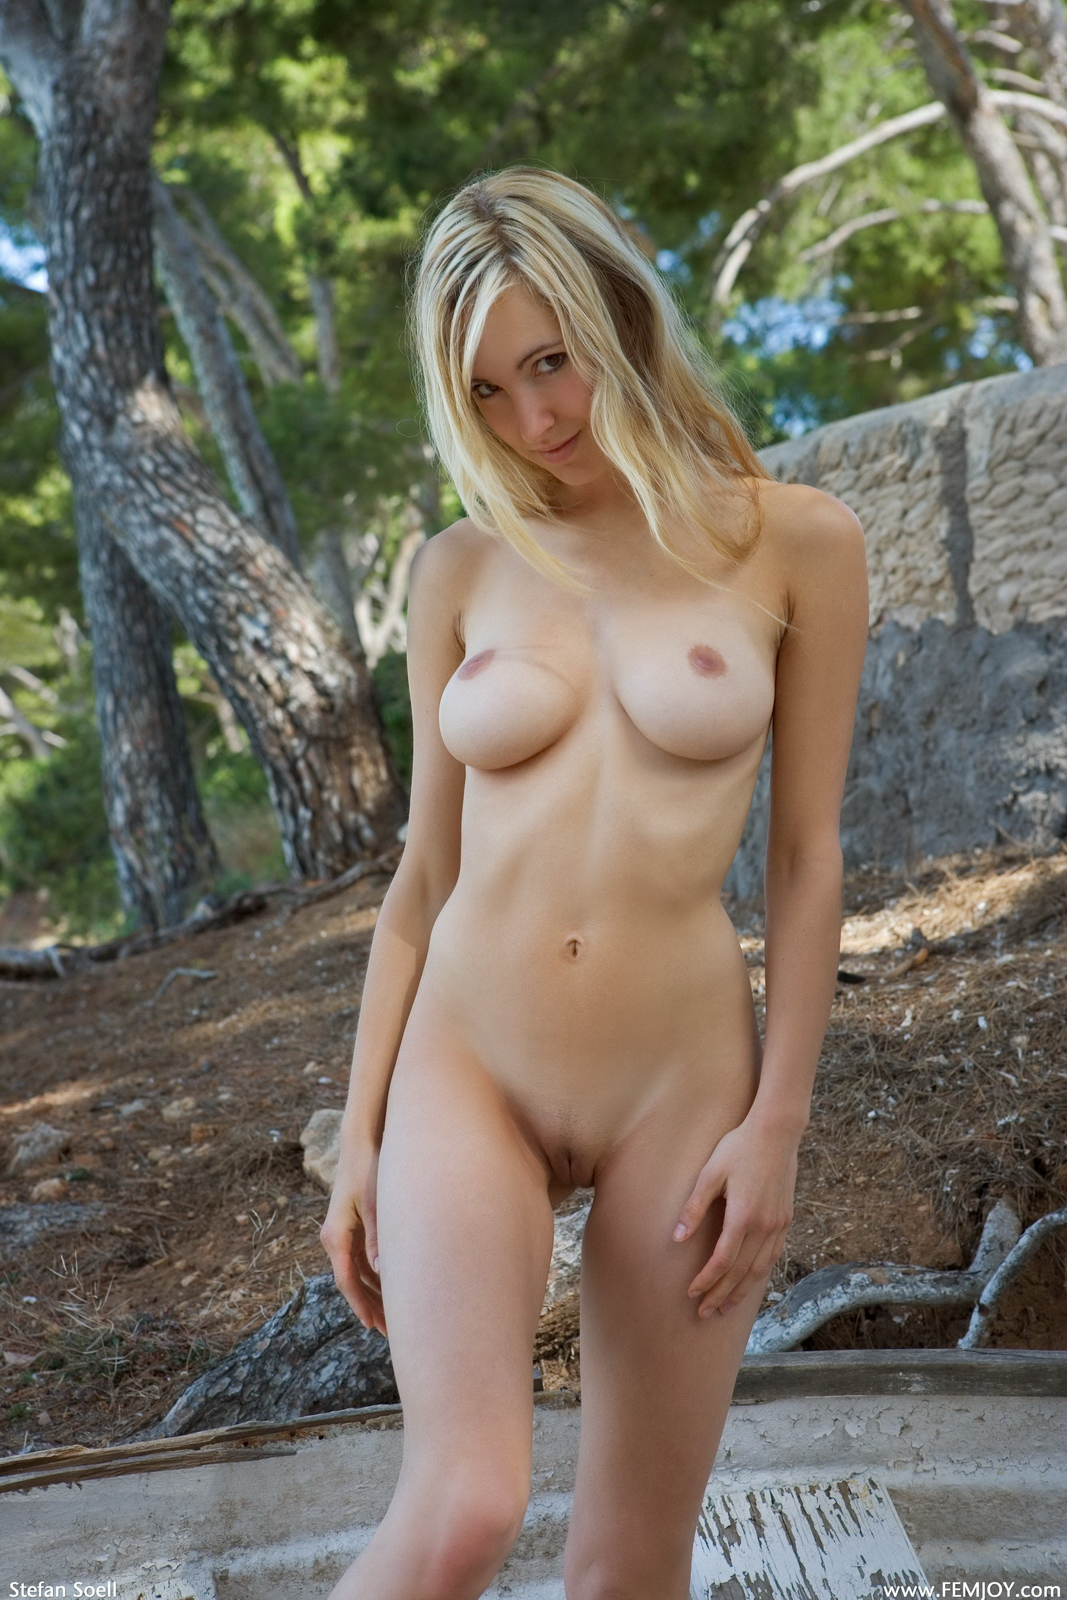 corinna-boat-blonde-tits-naked-femjoy-15